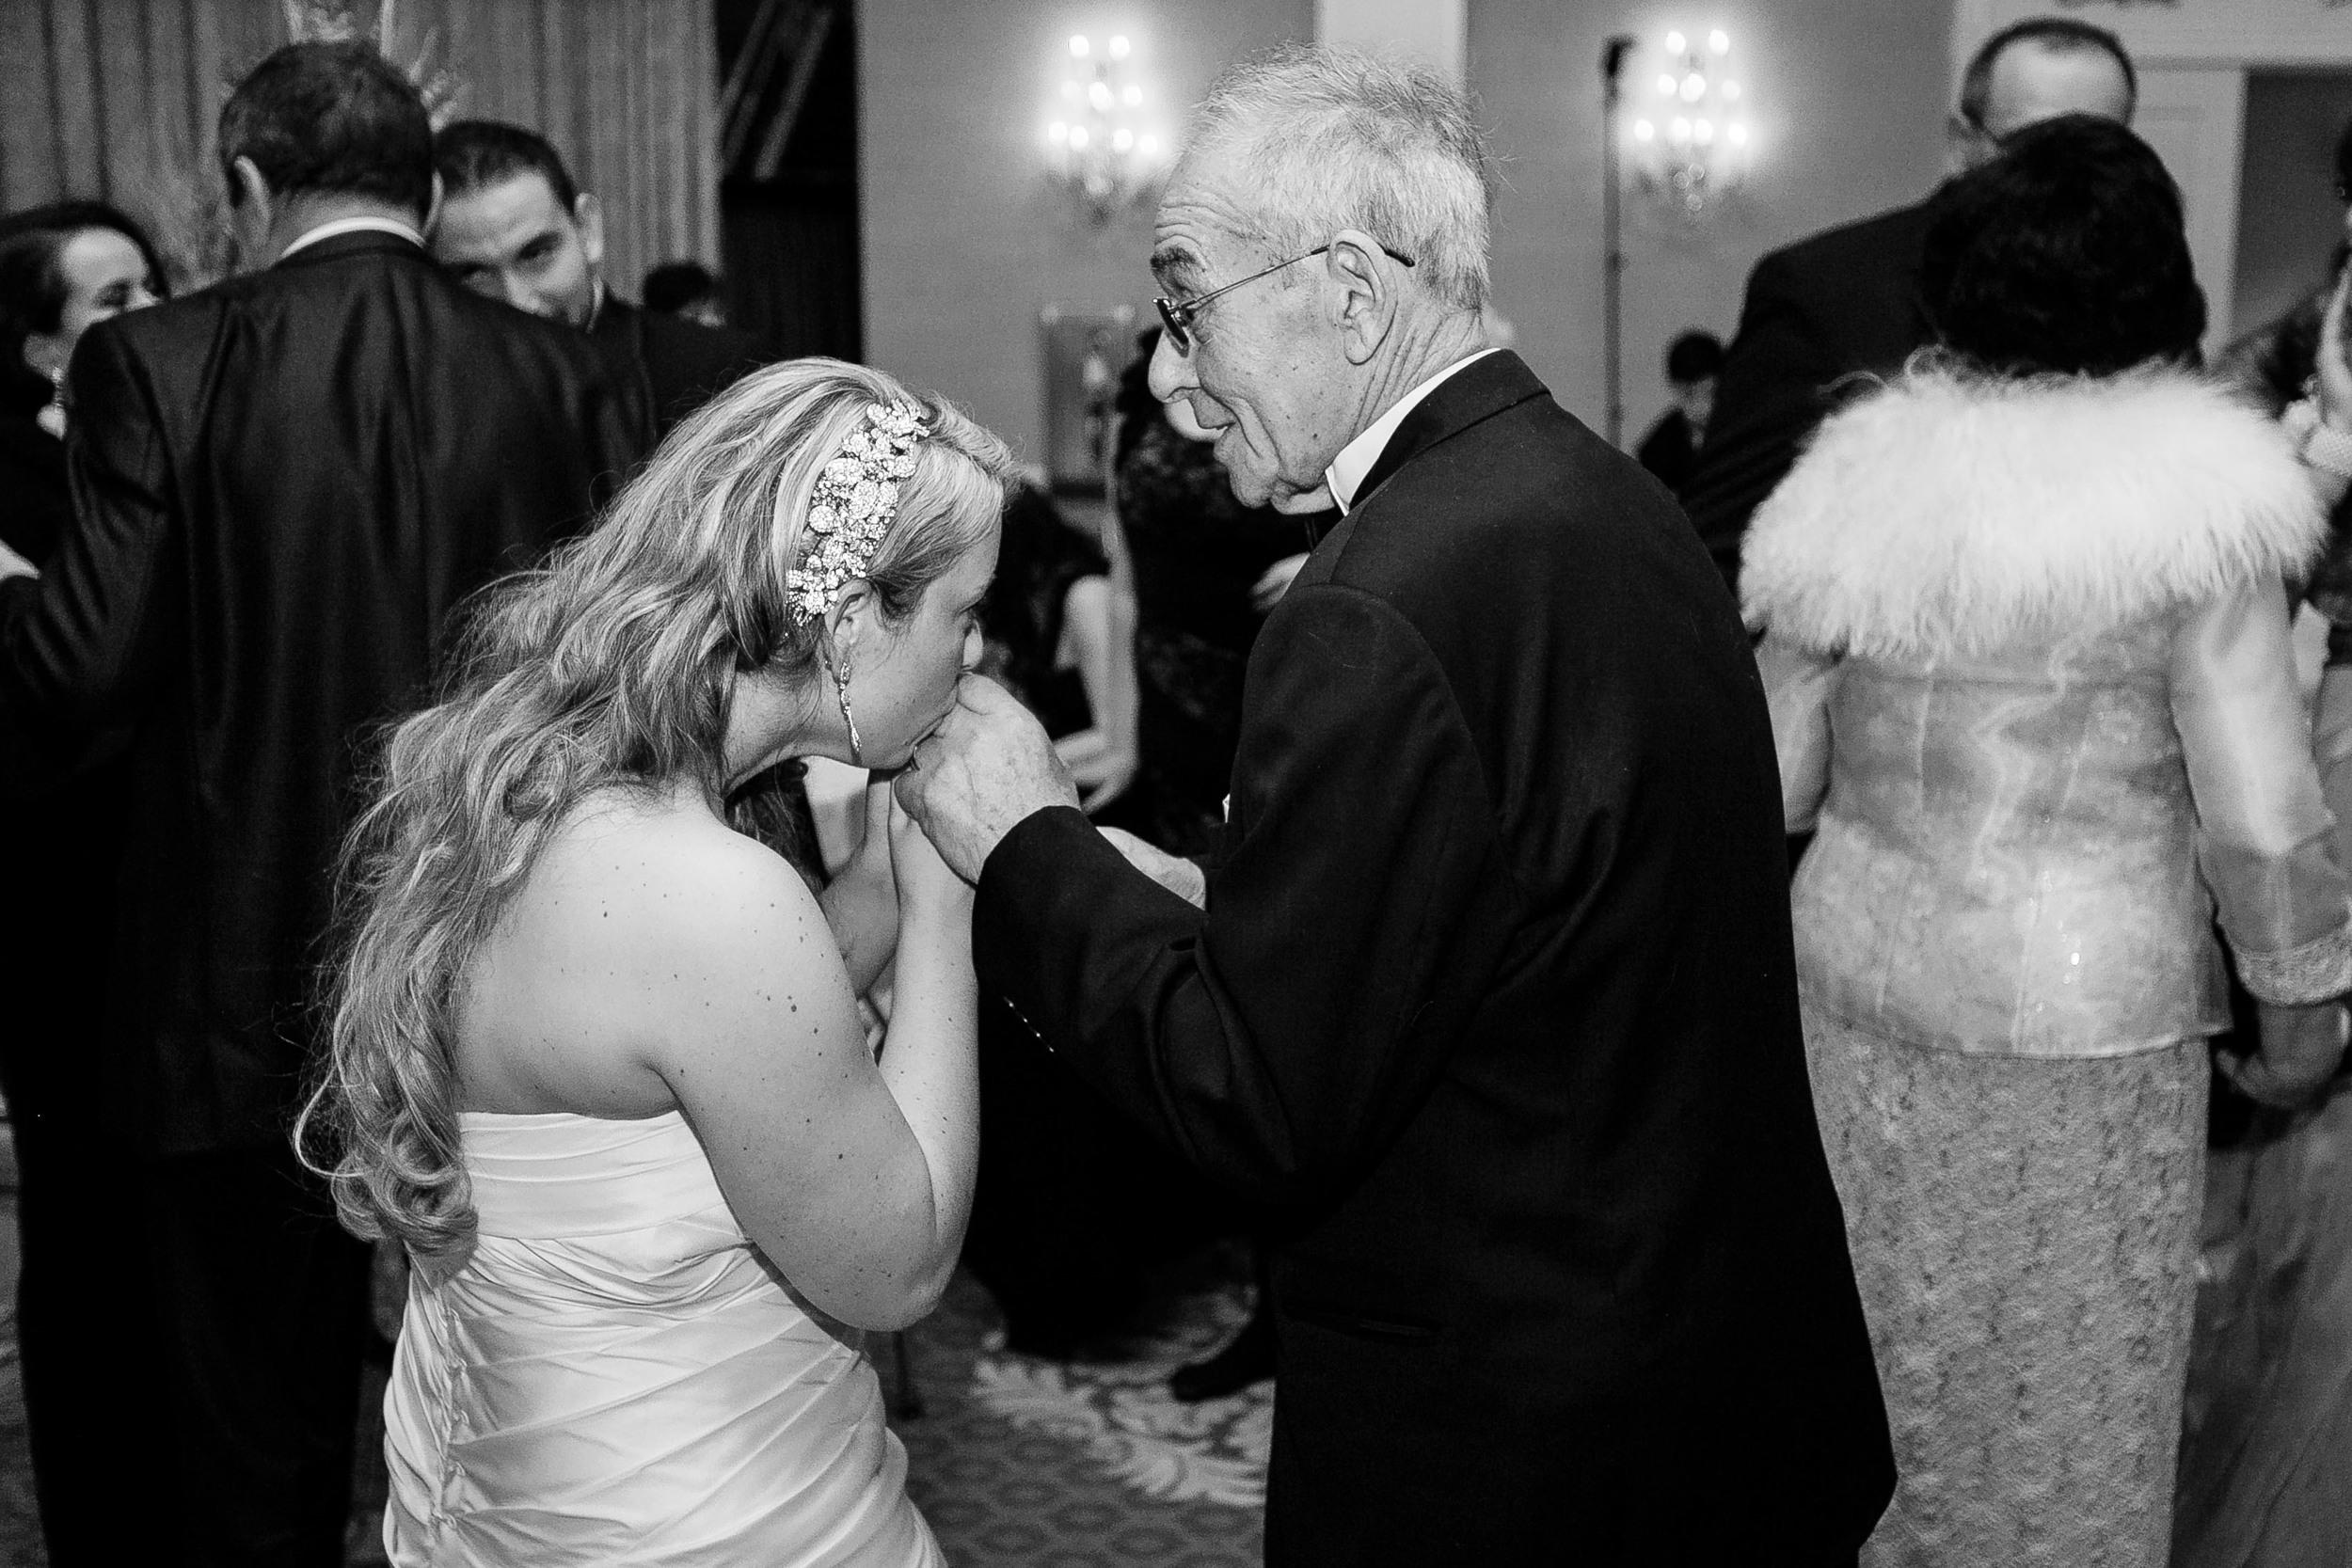 Russian-Jewish-Italian-Luxury-Wedding-The-Palace-at-Somerset-Park-NJ-Documentary-Wedding-Photography-16.jpg